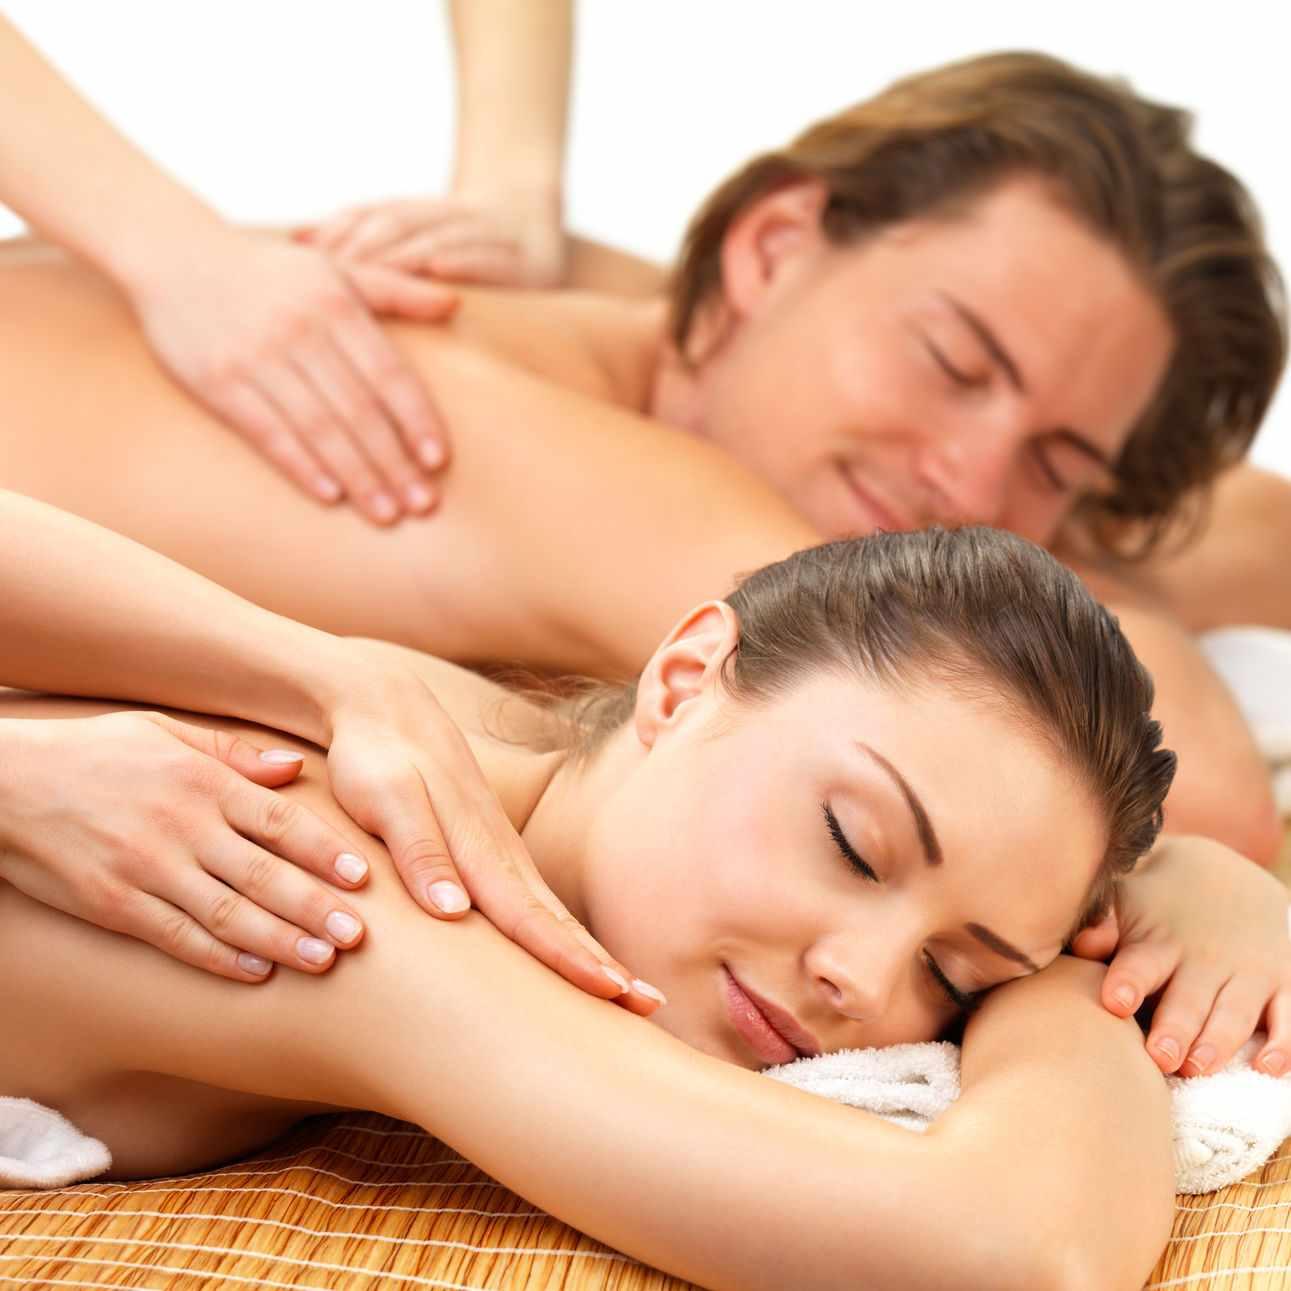 Clínica de massagem no Brooklin